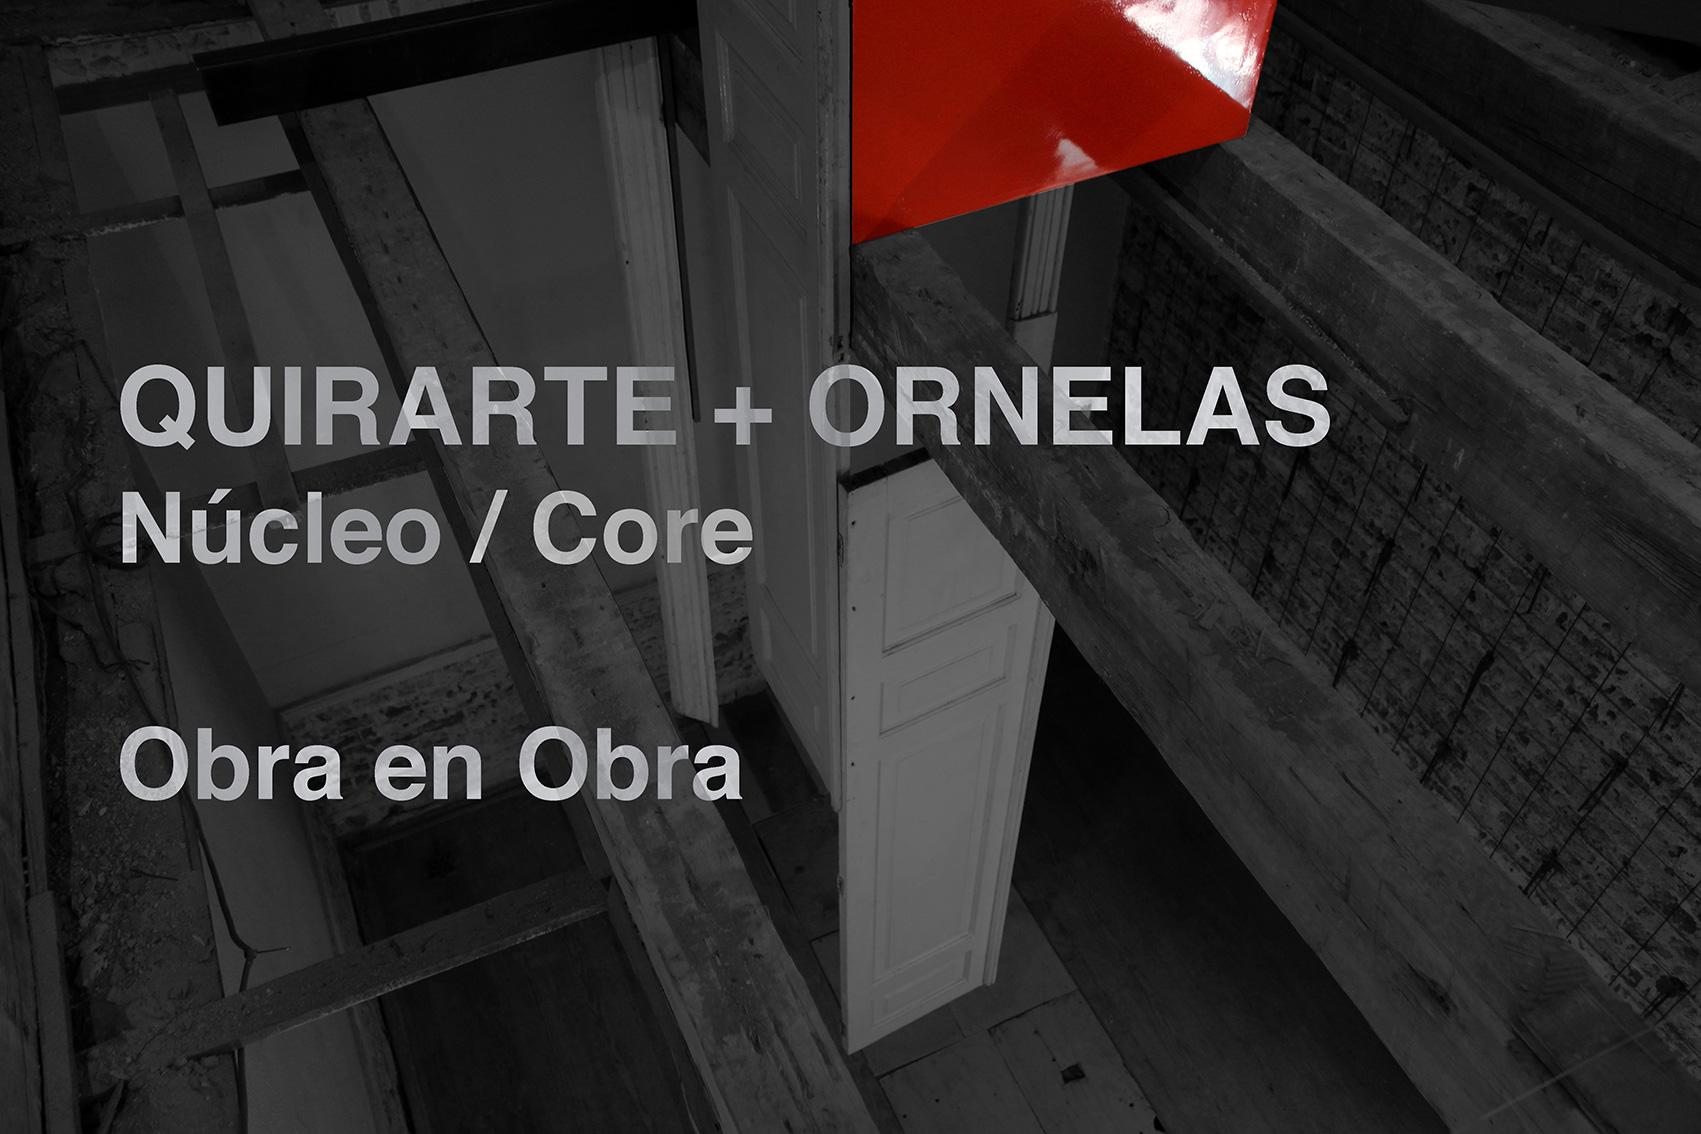 000-Caratula-ingles-web.jpg